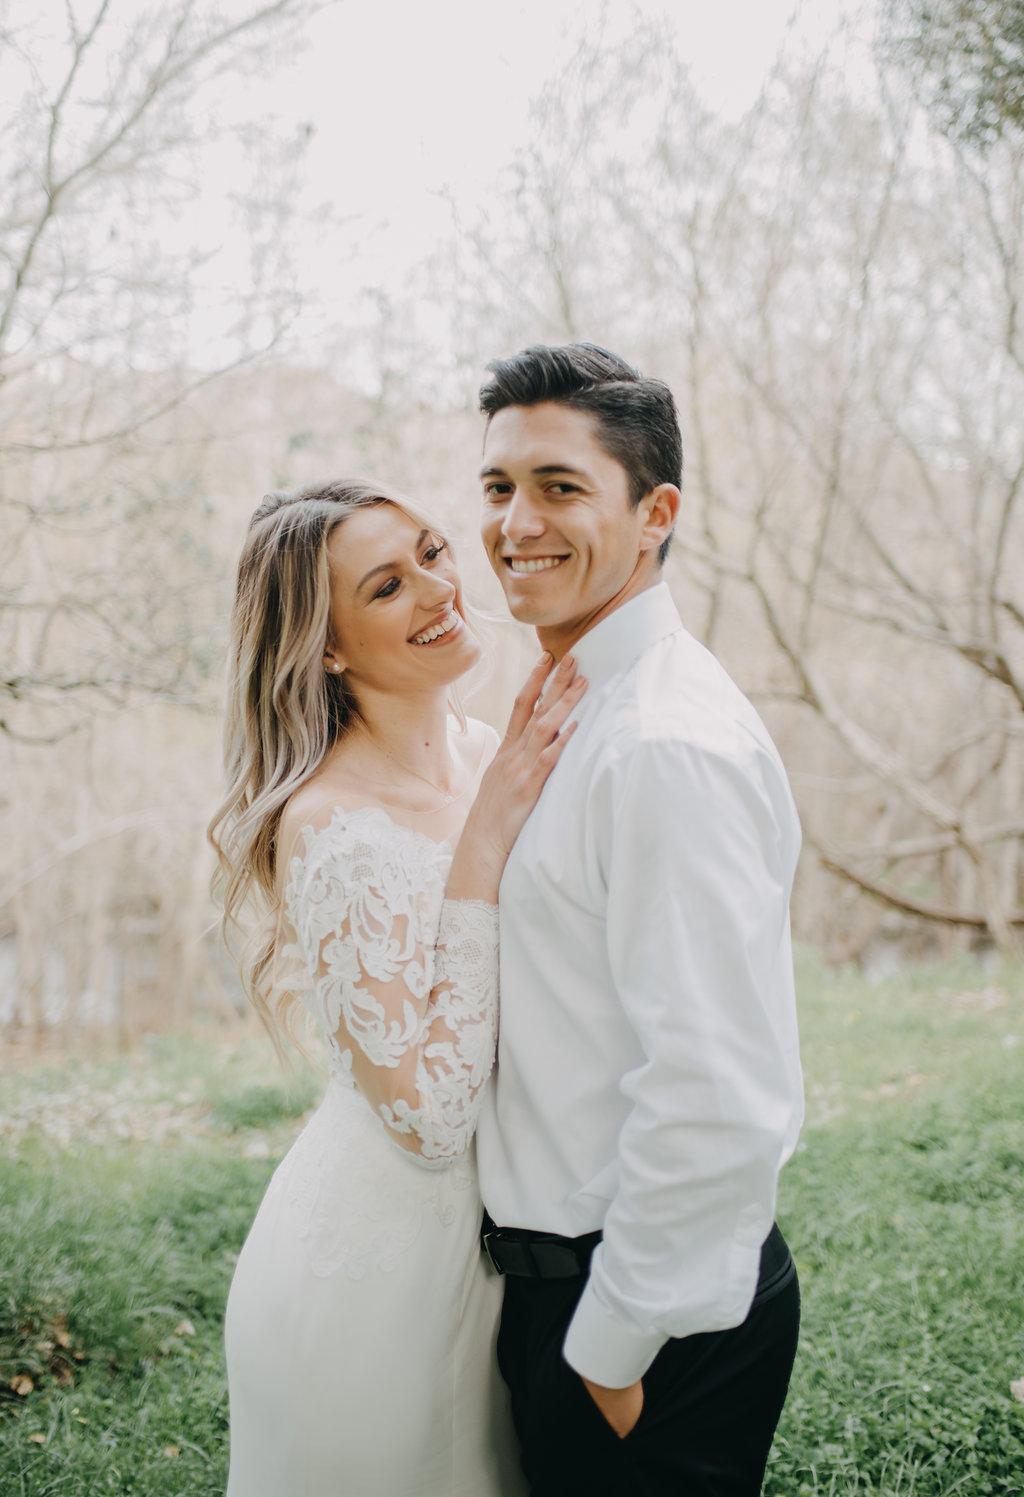 fun beautiful wedding photos bride and groom photo inspiration